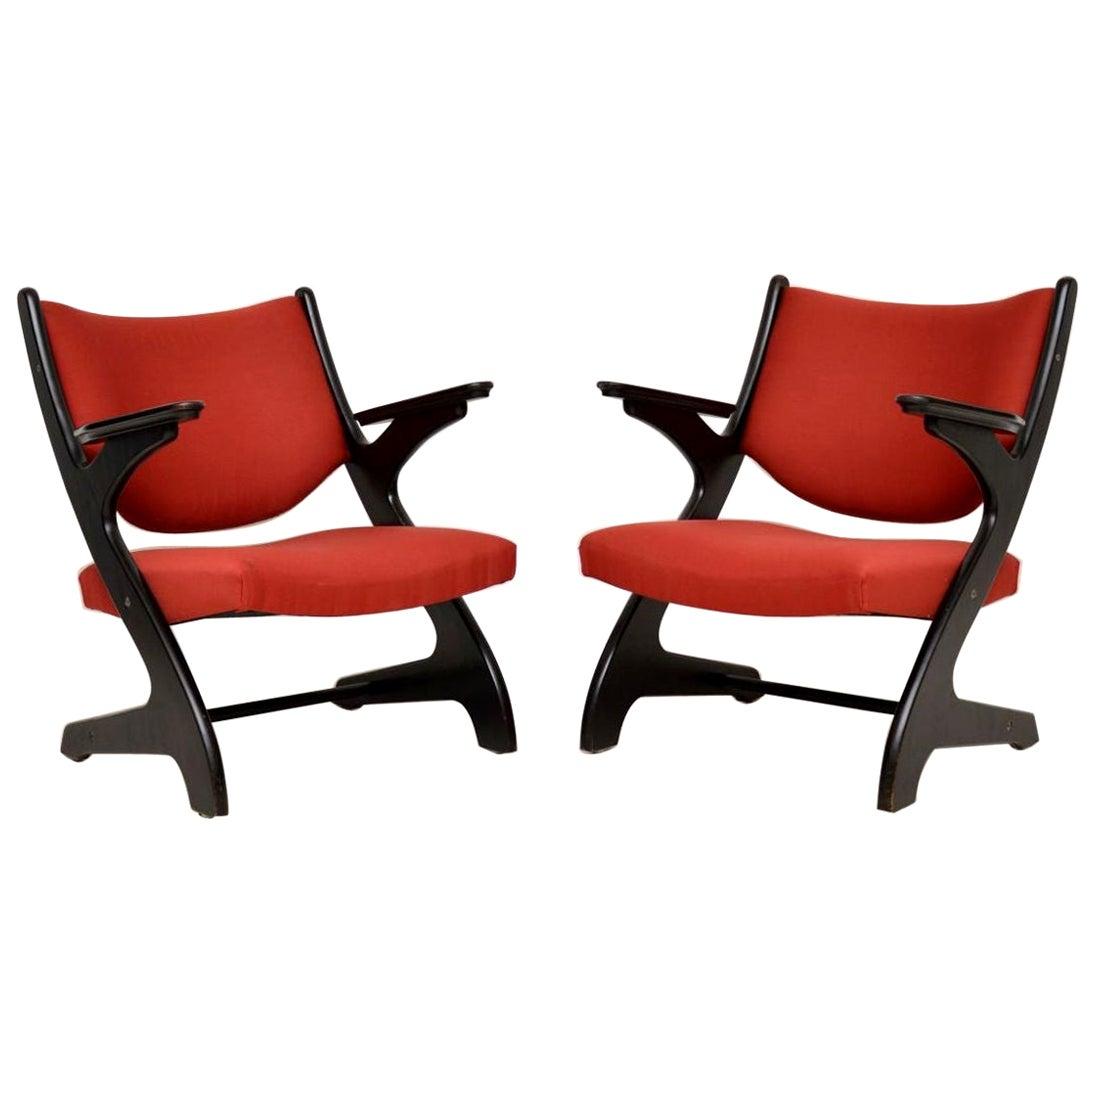 1960s Pair of Vintage Italian Armchairs